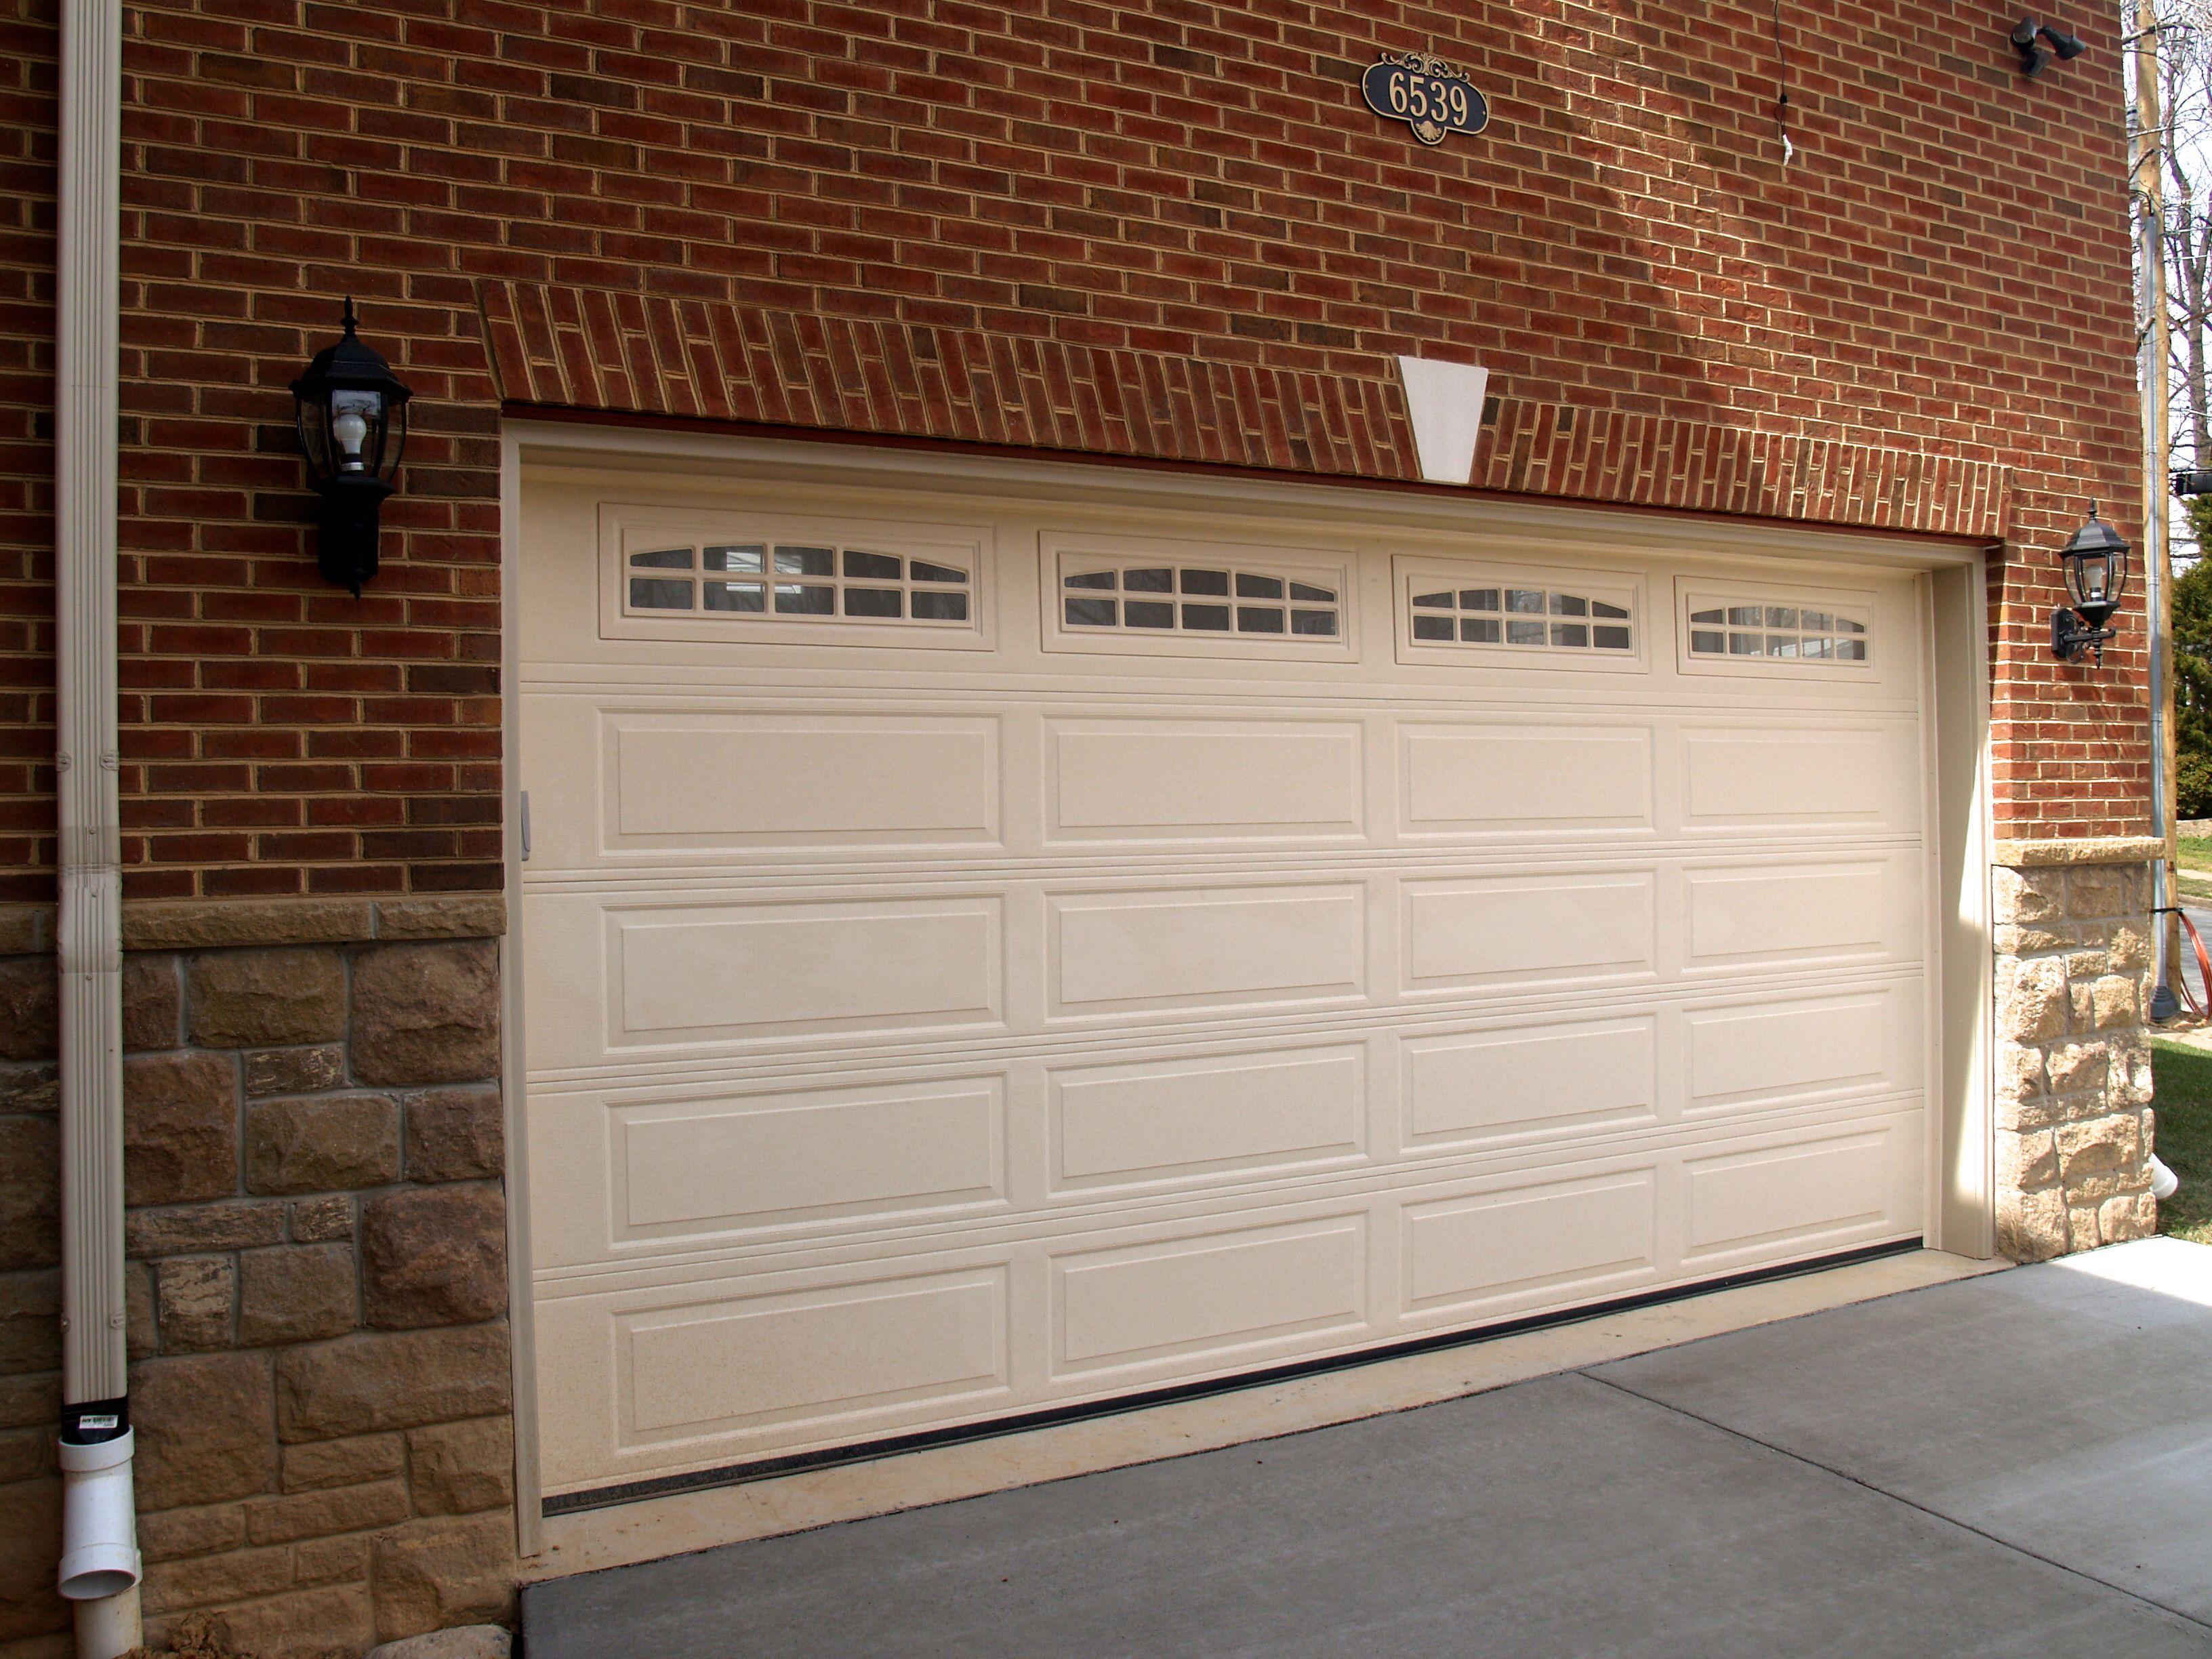 installations garage products new vancouver dalton photo wayne shoot door wa